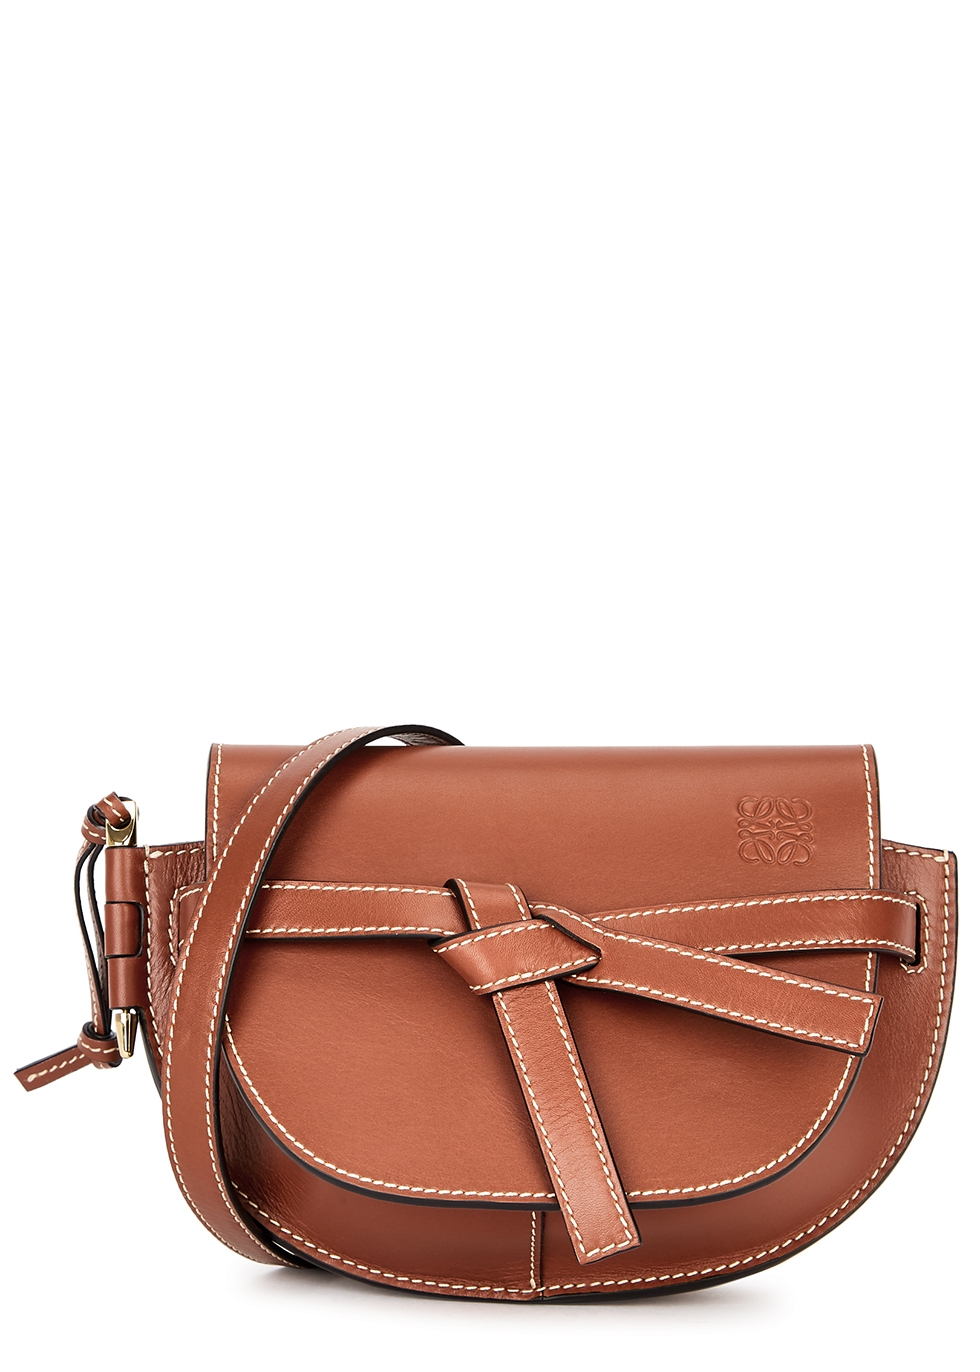 Gate mini leather cross-body bag